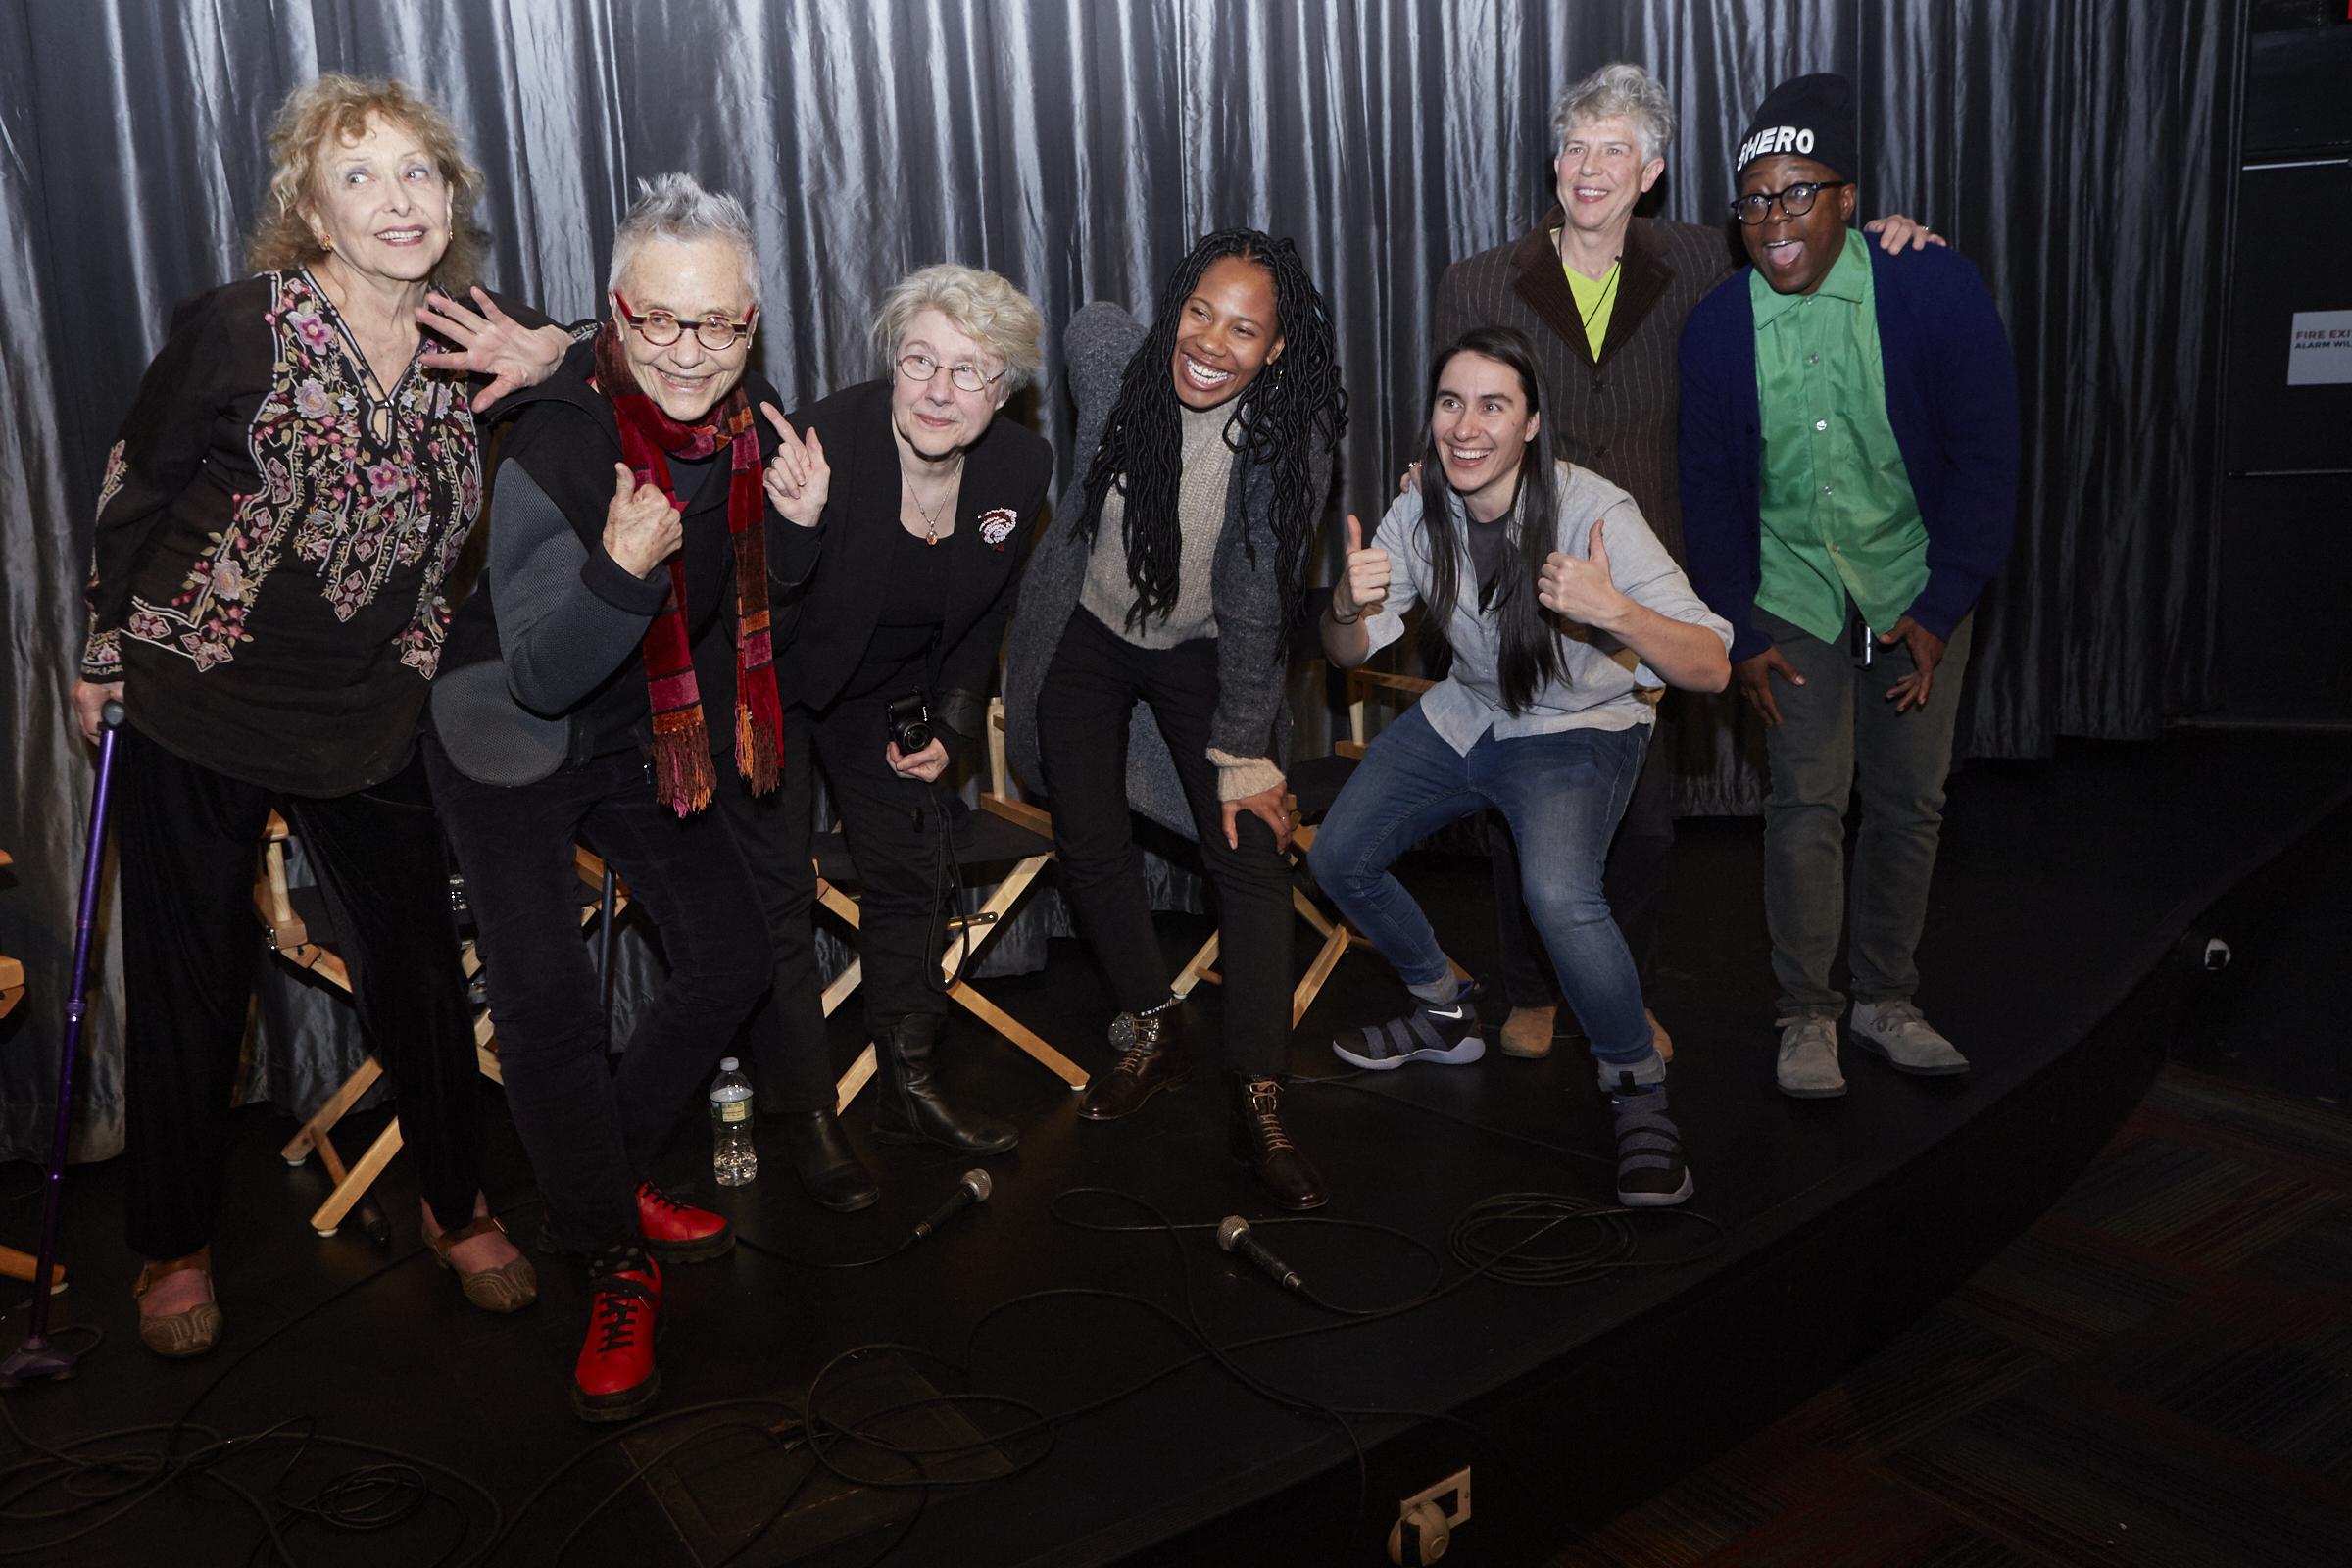 Carolee Scheenmann, Barbara Hammer, Martha Rosler, Fair Brane, Vanessa Haroutunian, Su Friedrich, and Cheryl Dunye (Photo by Eric McNatt)